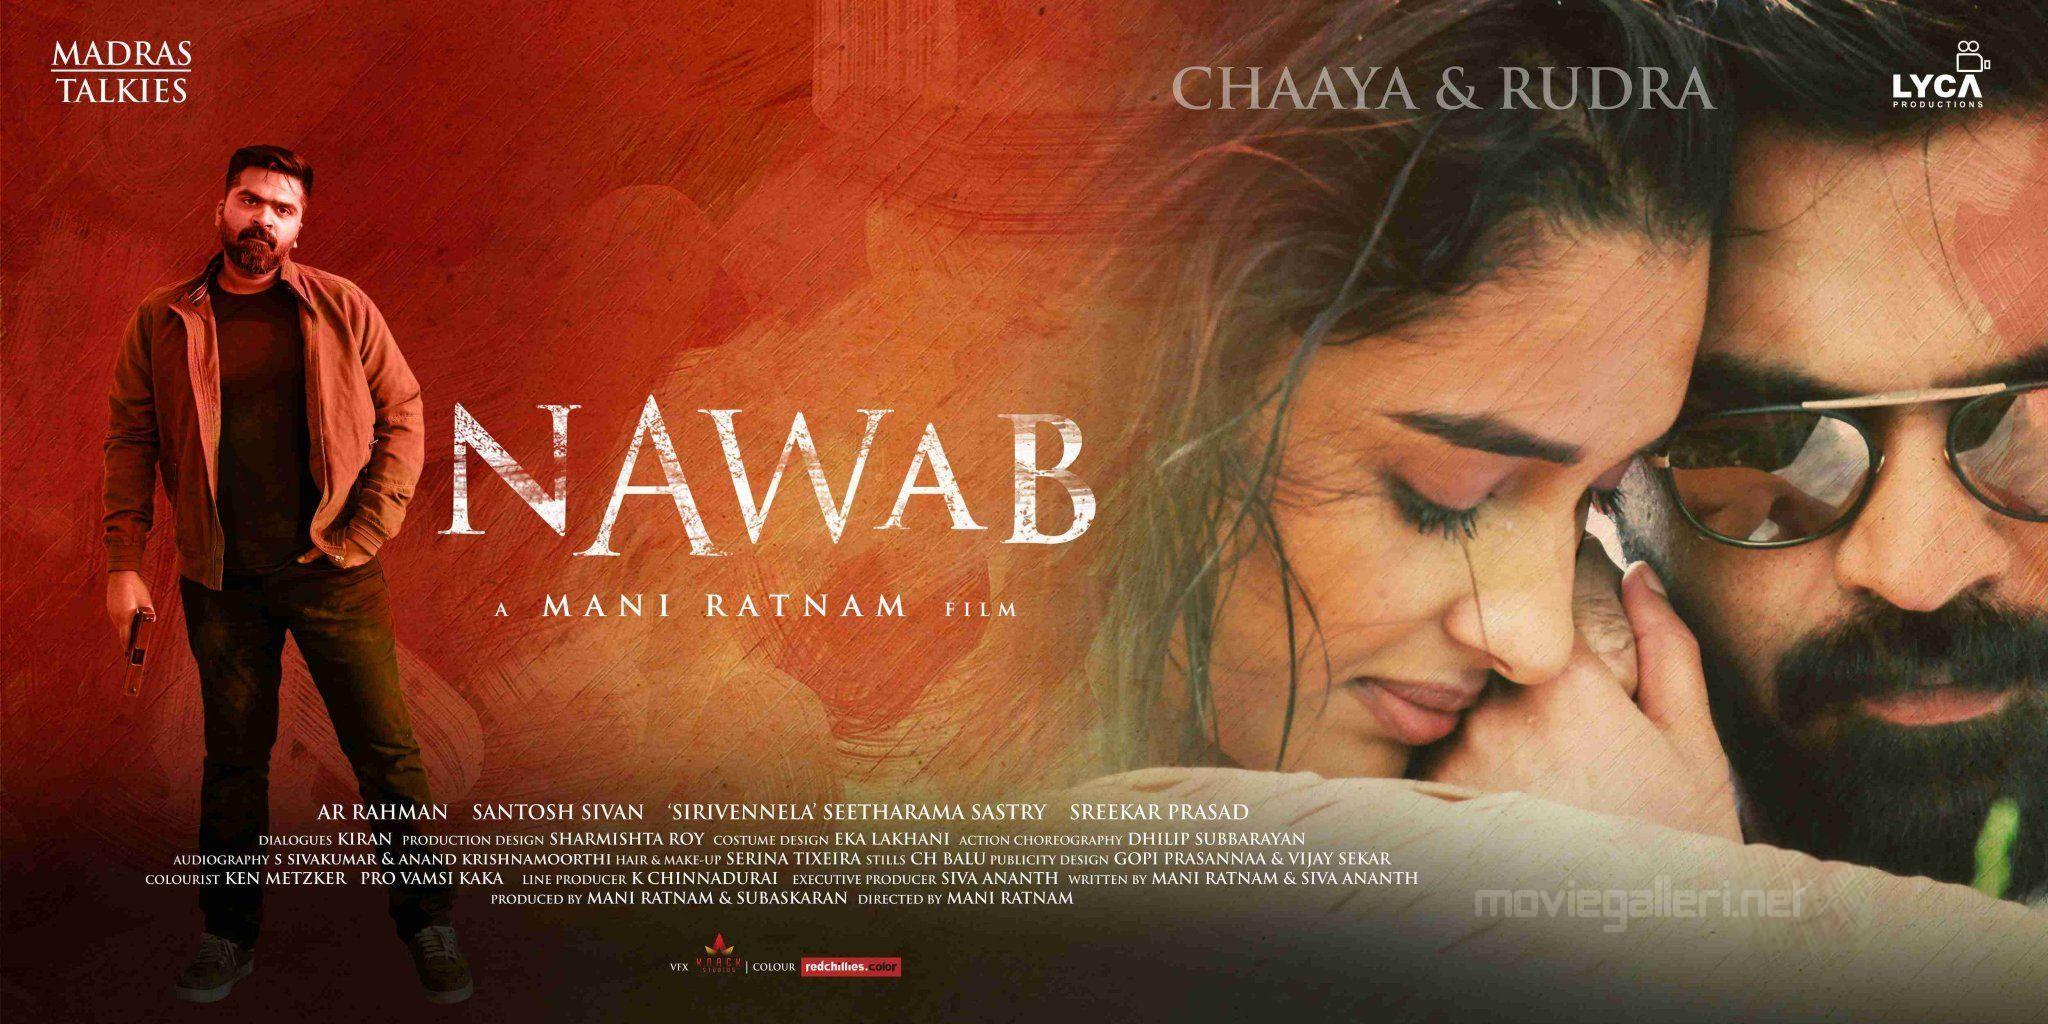 Simbu Rudra, Dayana Erappa as Chaaya in Nawab Movie Poster HD